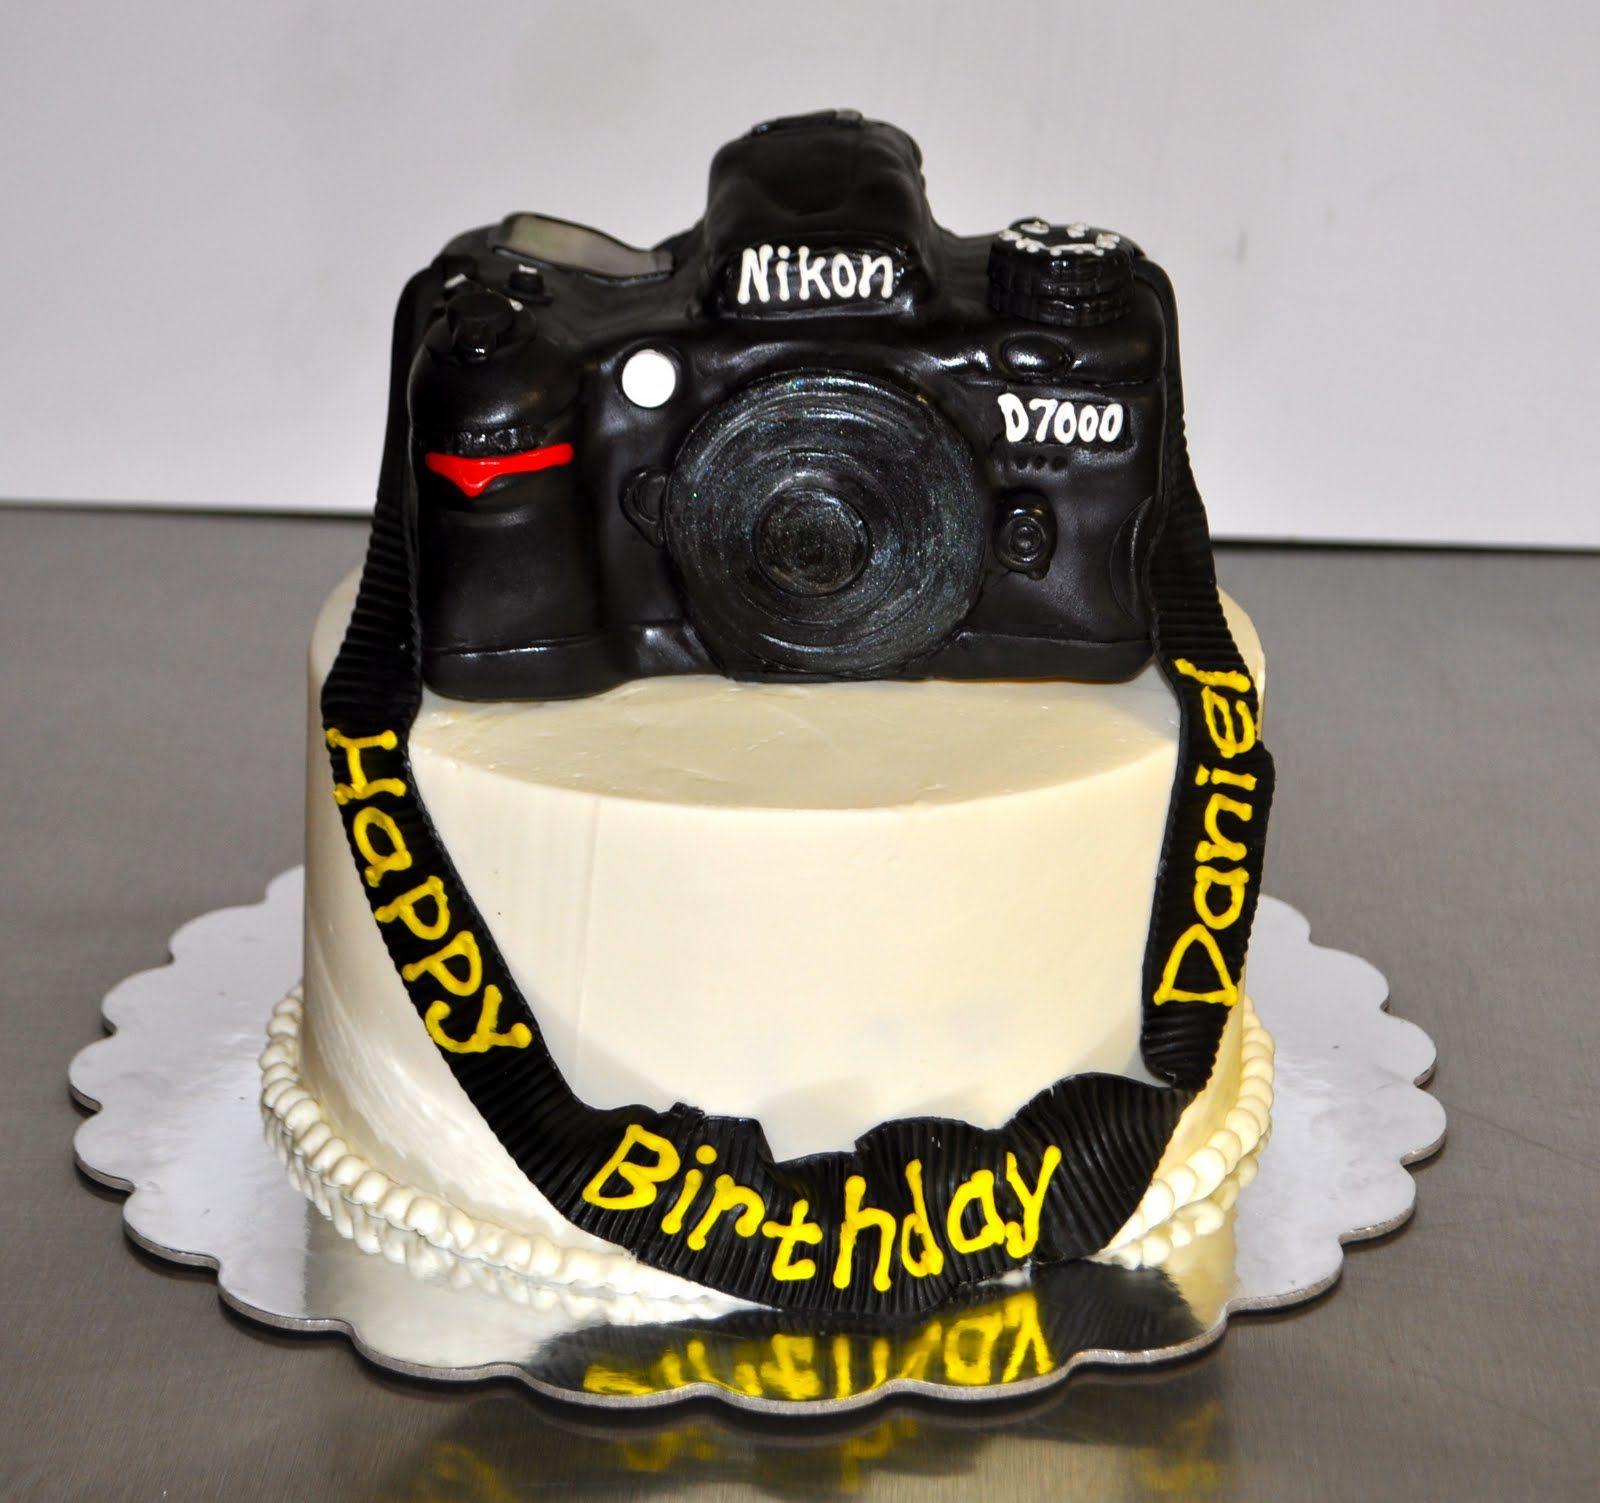 I NIKON BIRTHDAY 63